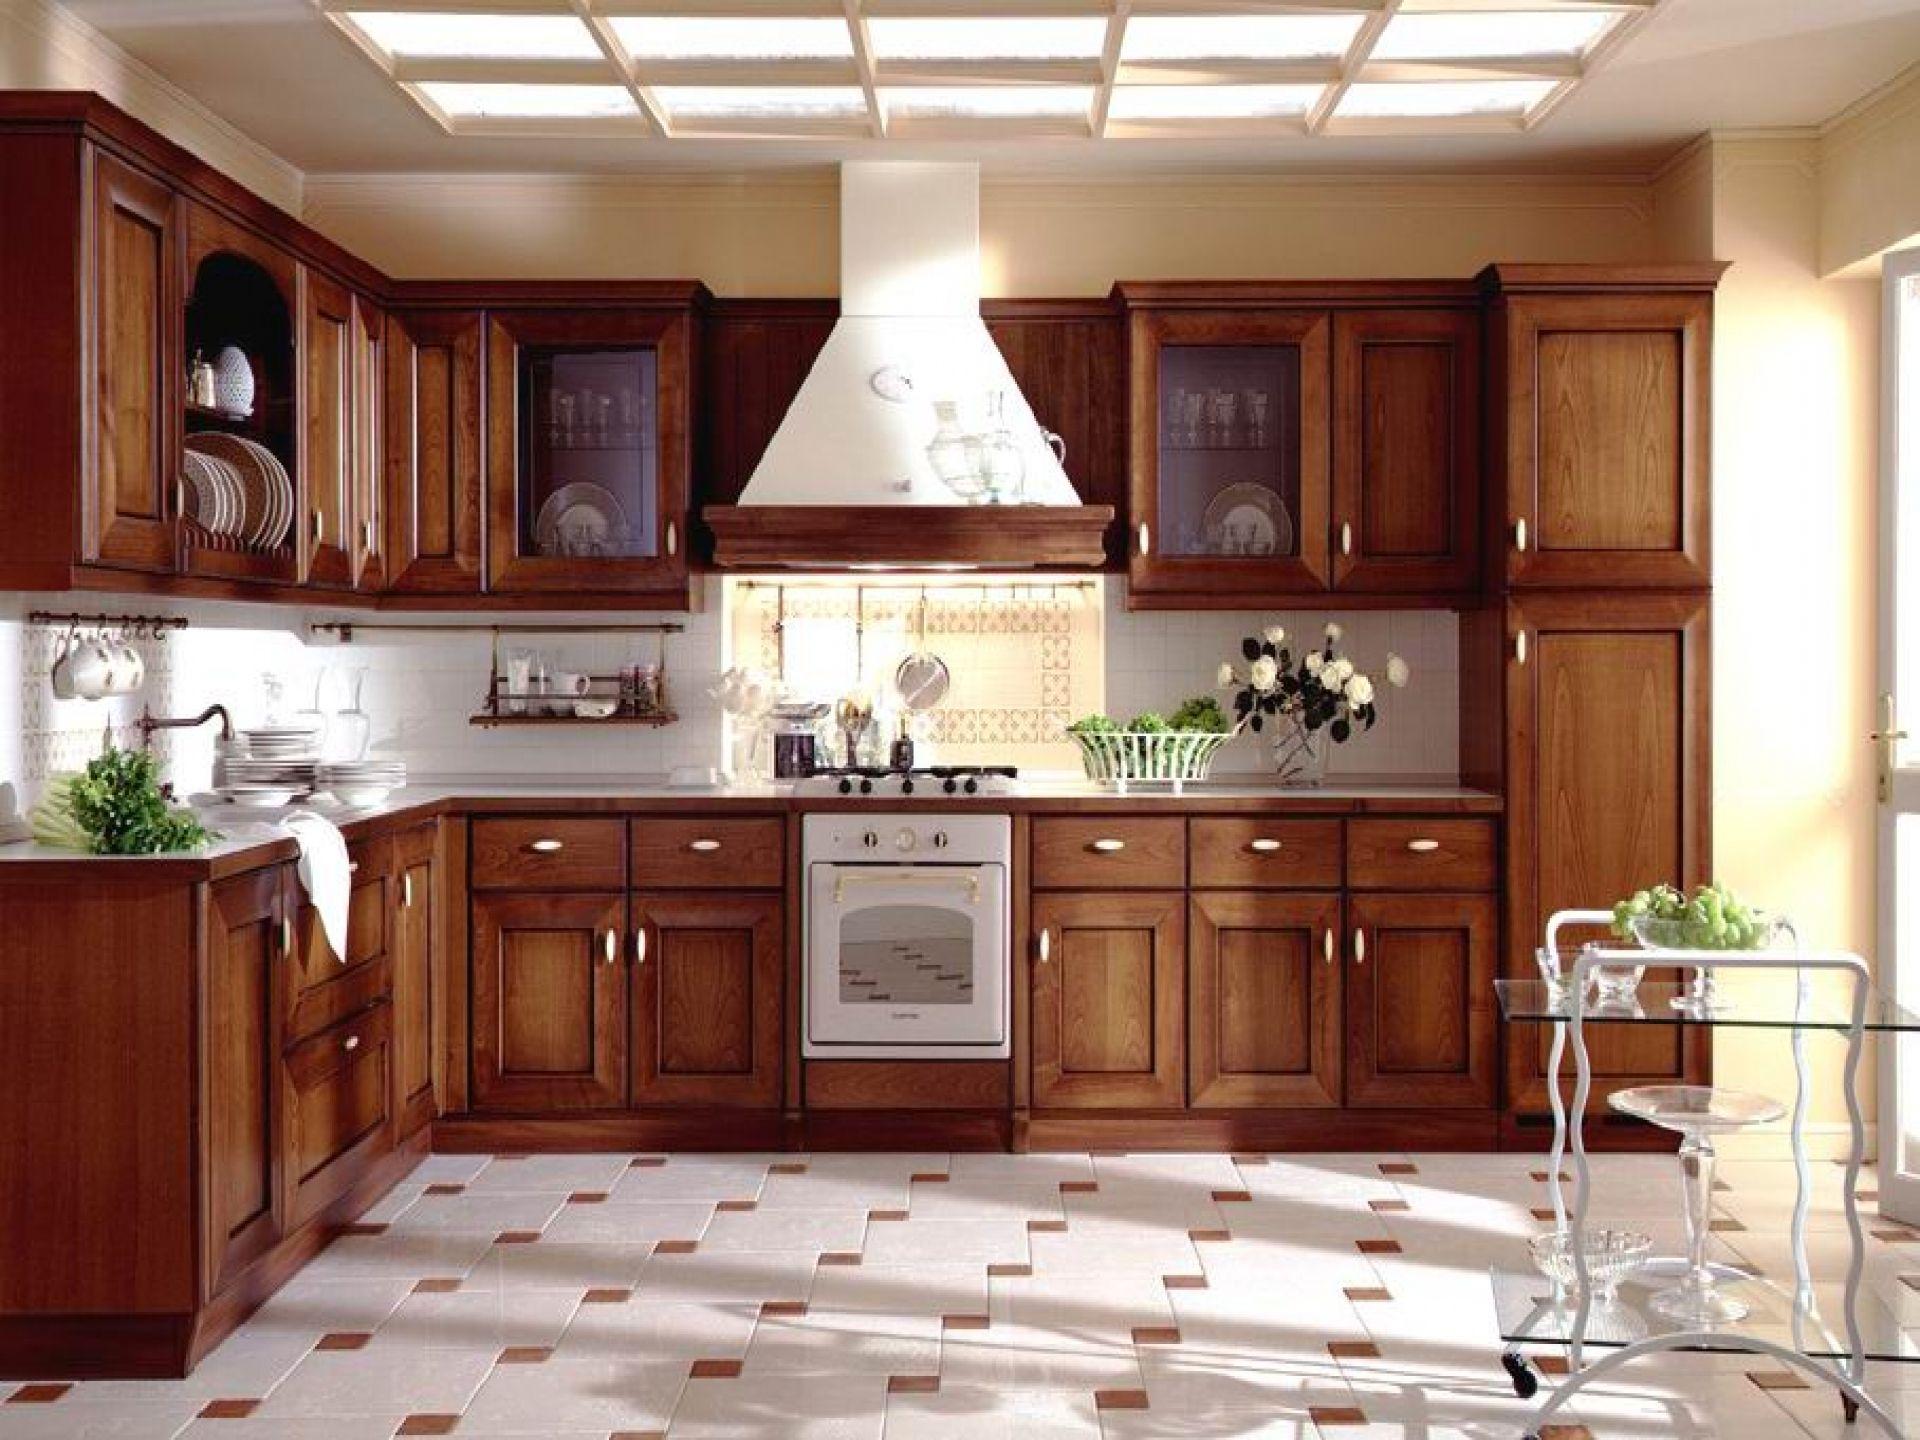 Küche Kabinett Design Tool - Schlafzimmer | Hausmodelle | Pinterest ...